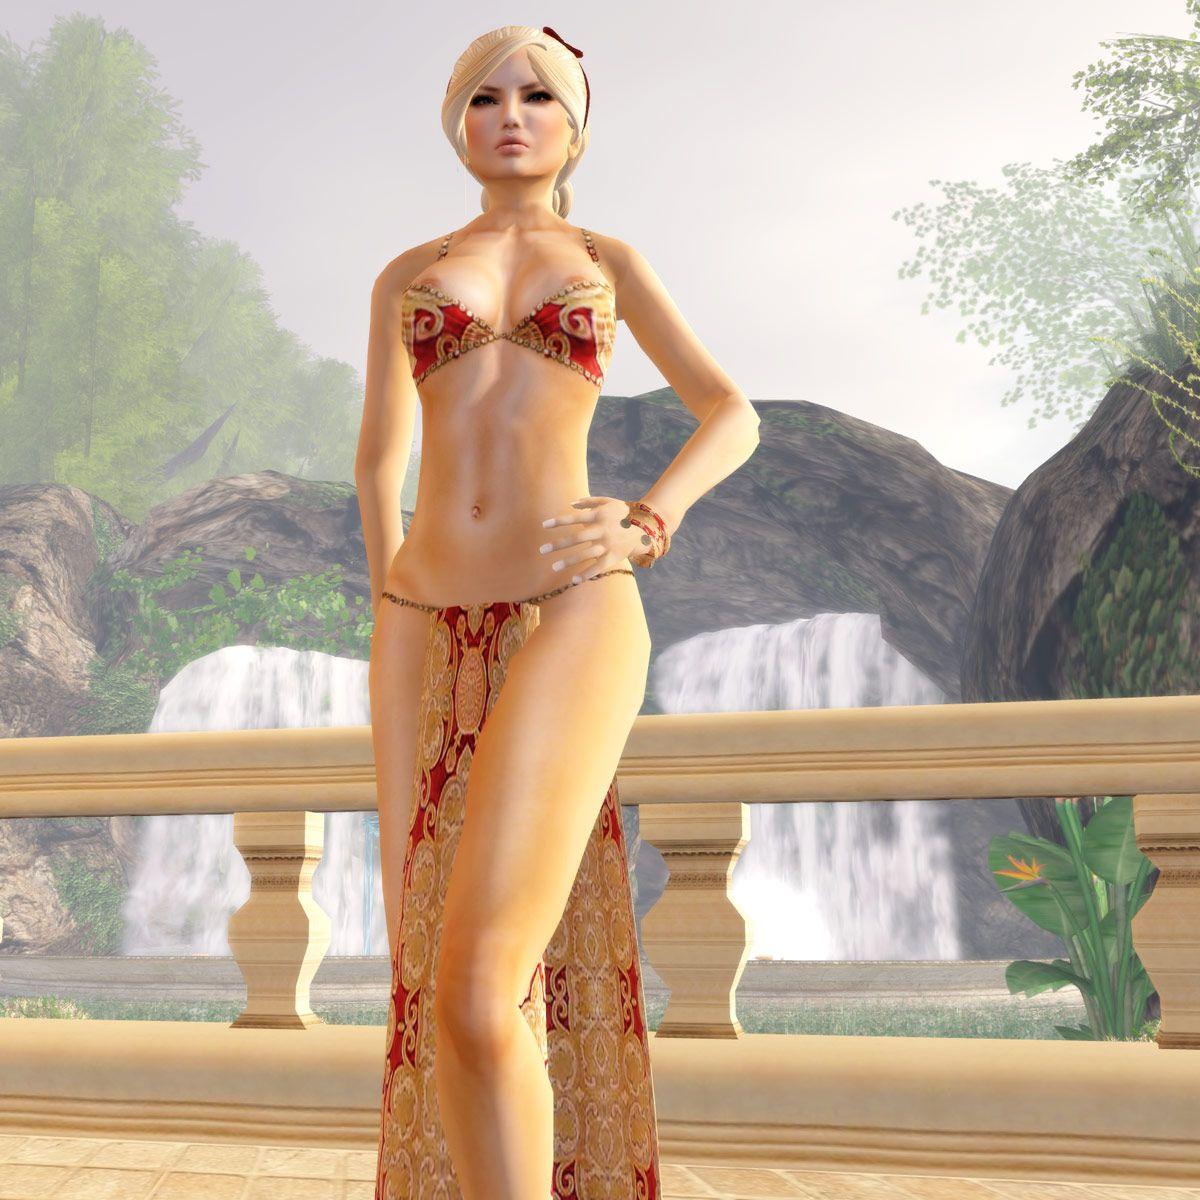 Gamely nudism in banya